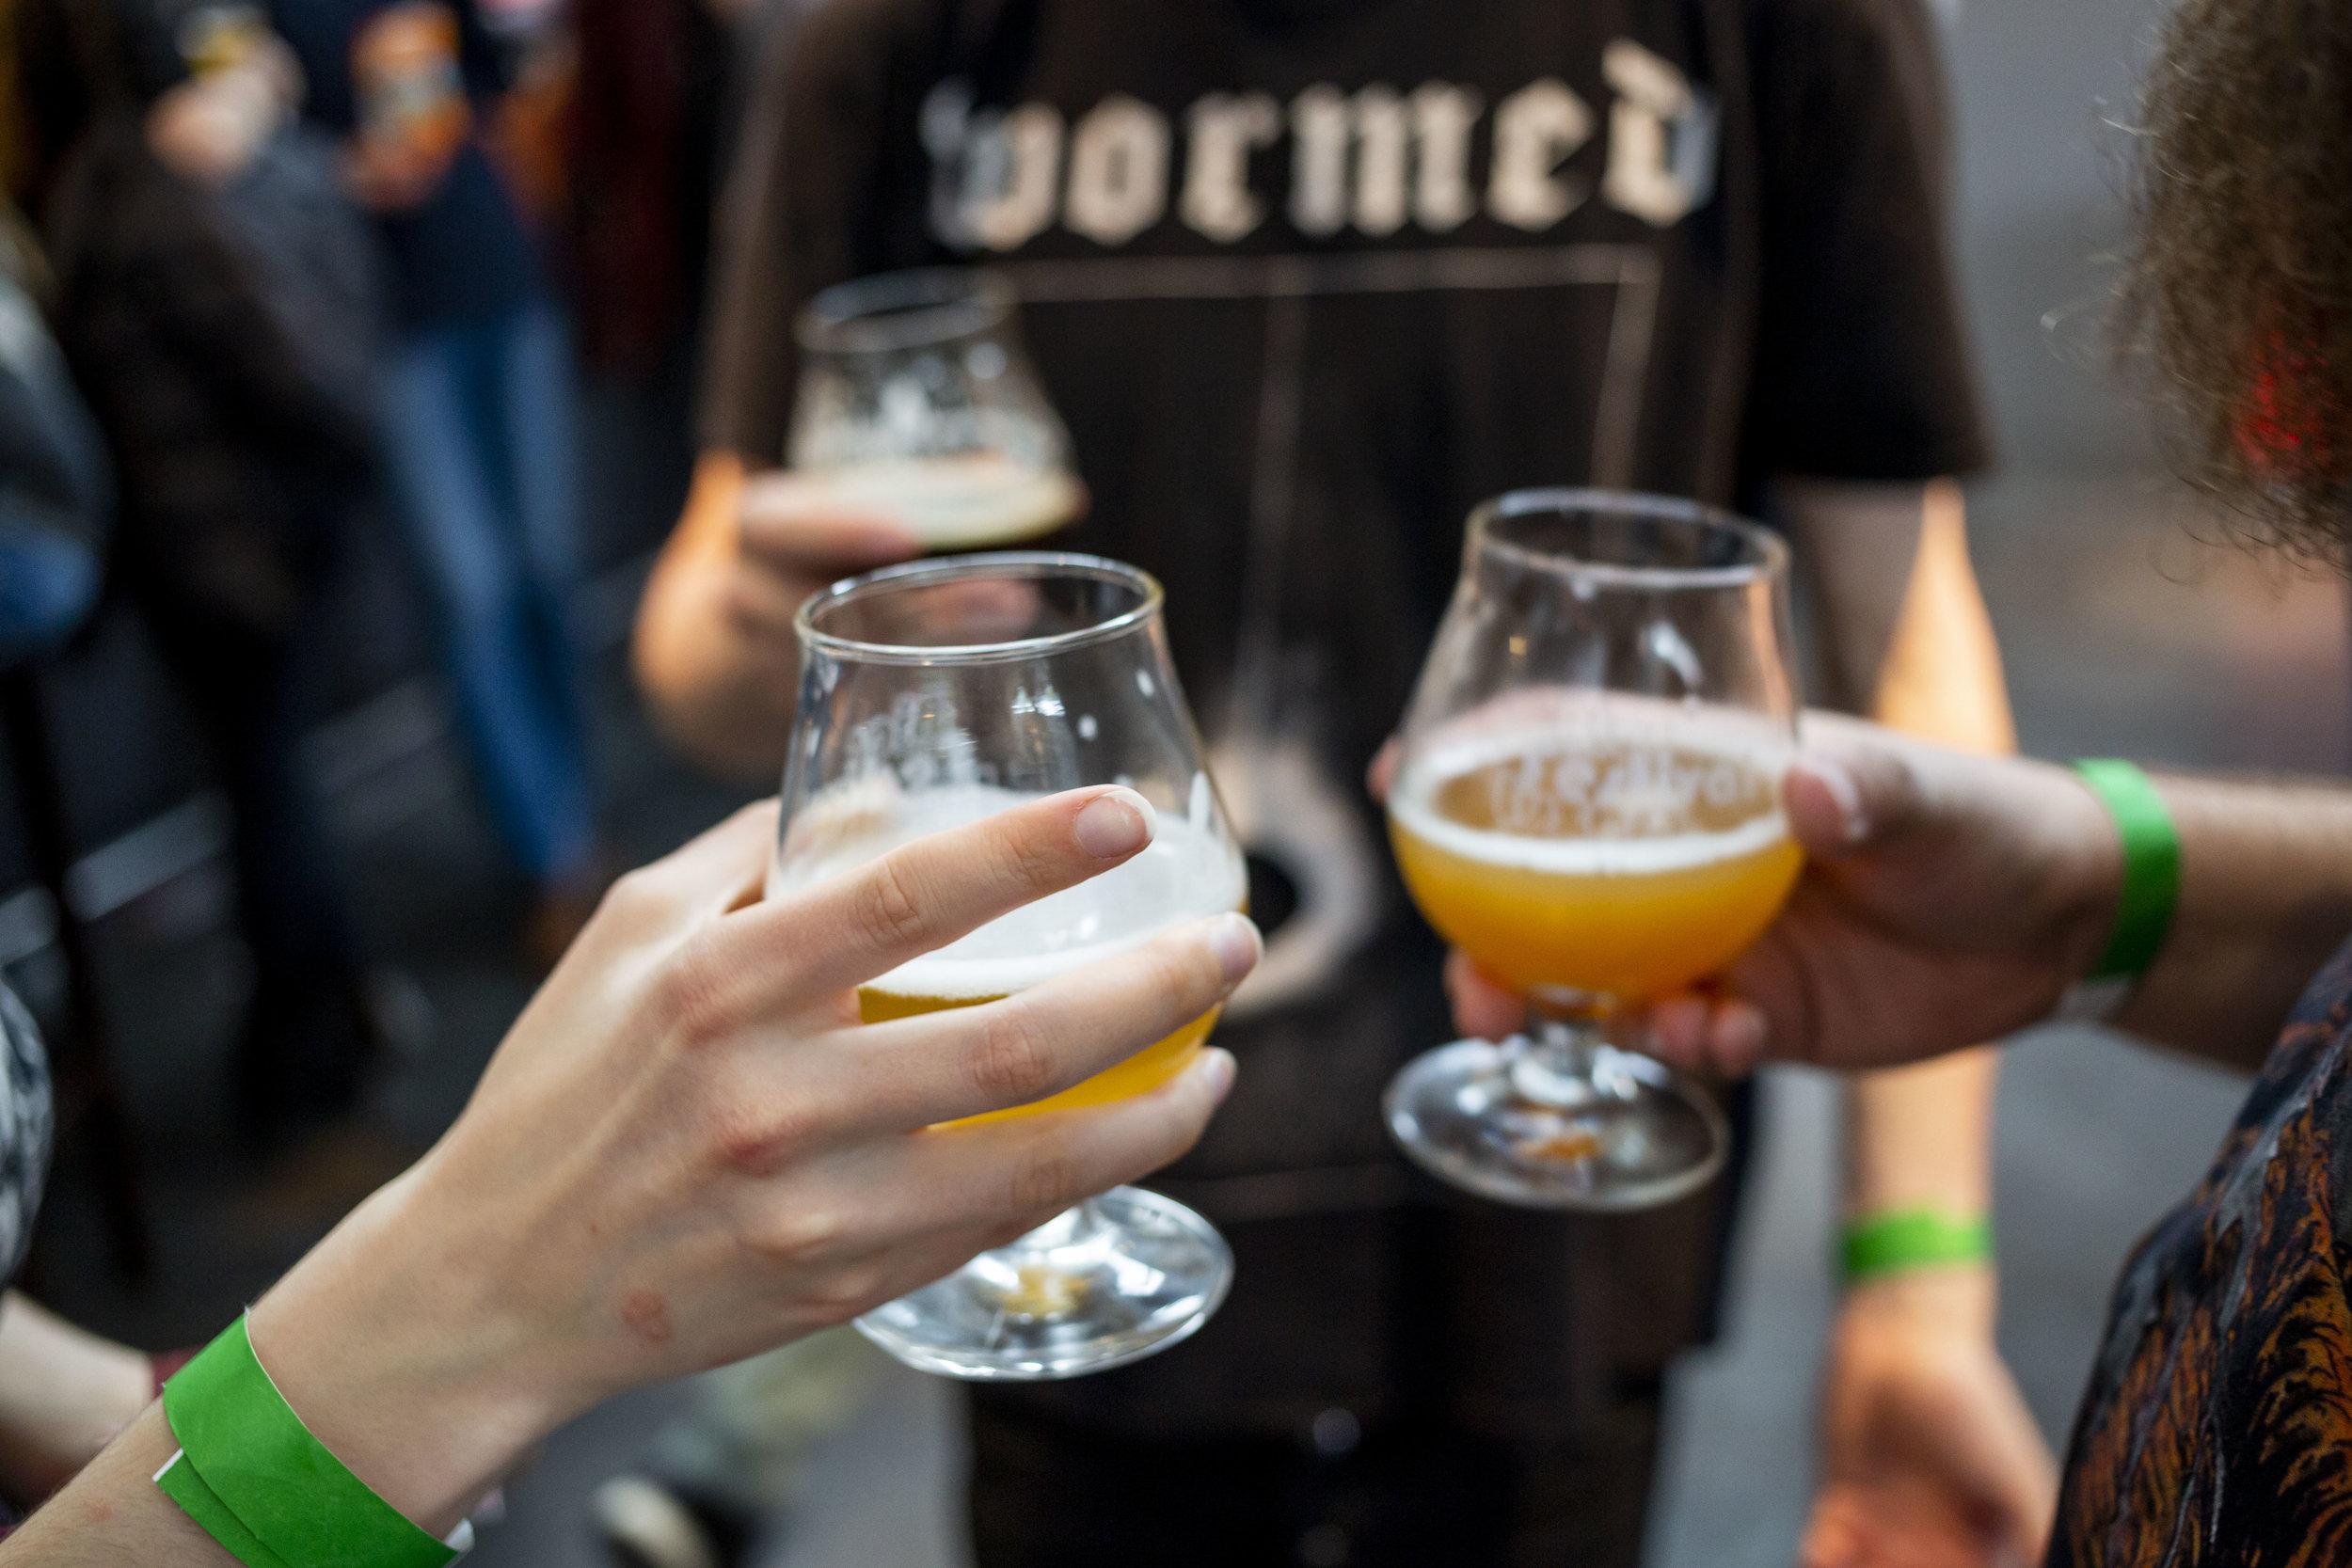 BierfestivalLuzern-38.jpg